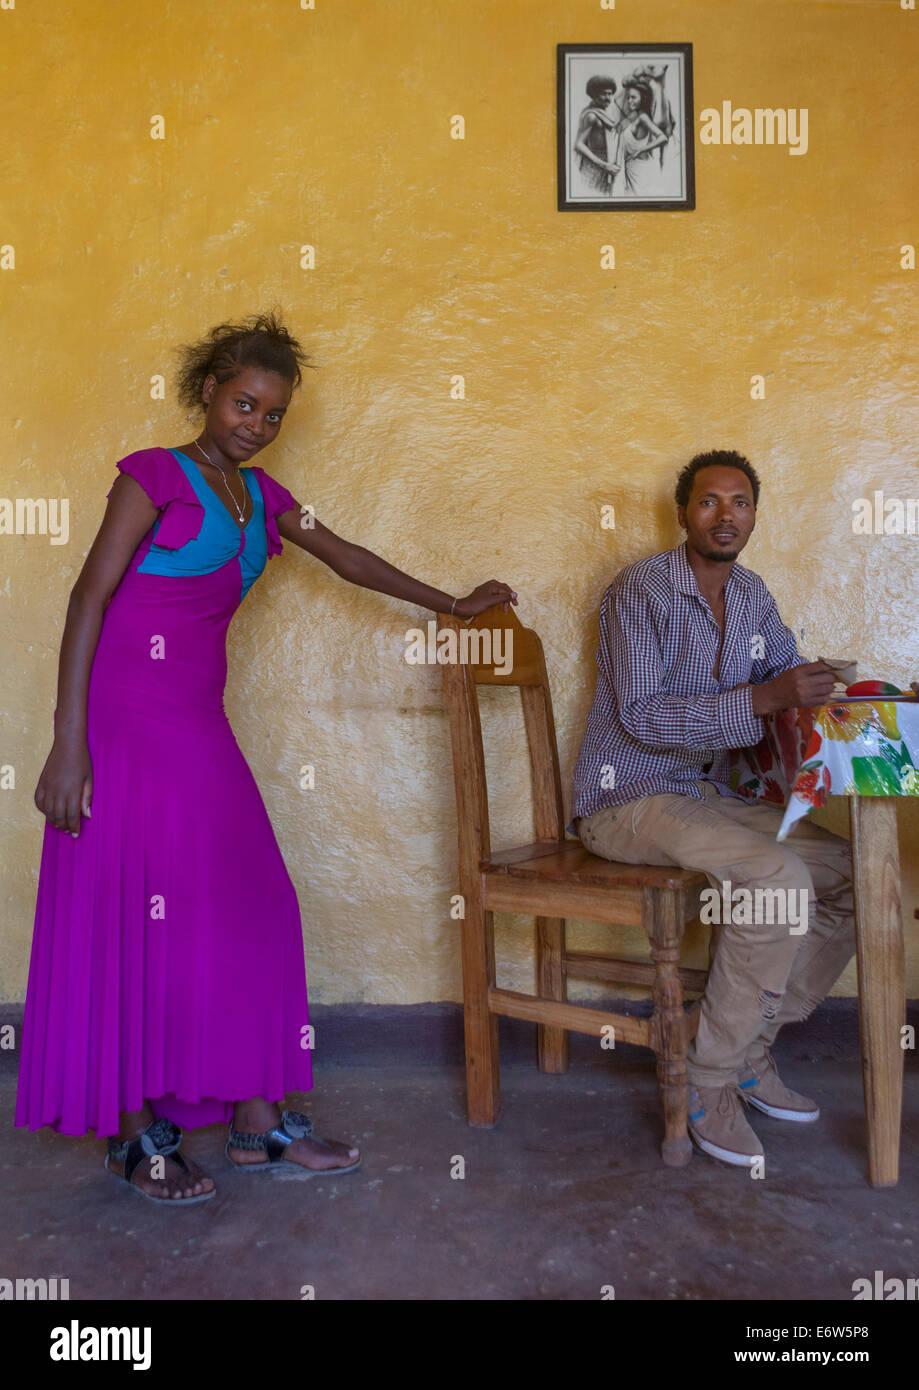 couple In A Restaurant, Daolo Ethny, Tepi, Ethiopia - Stock Image